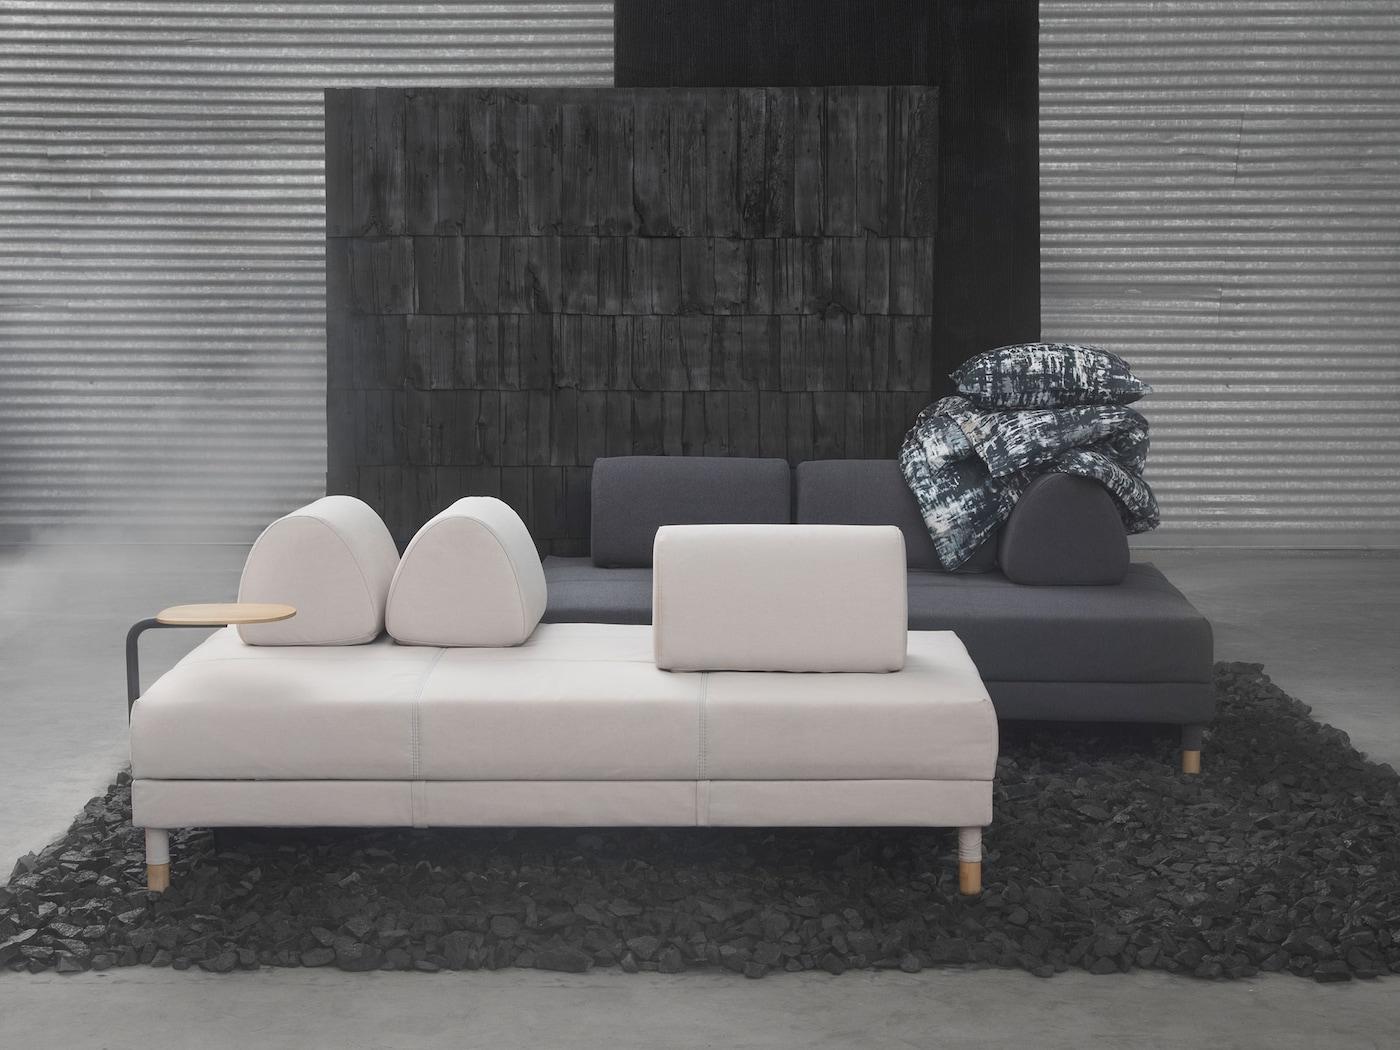 Sencillez con un sof cama ikea for Sofa cama con cajones ikea